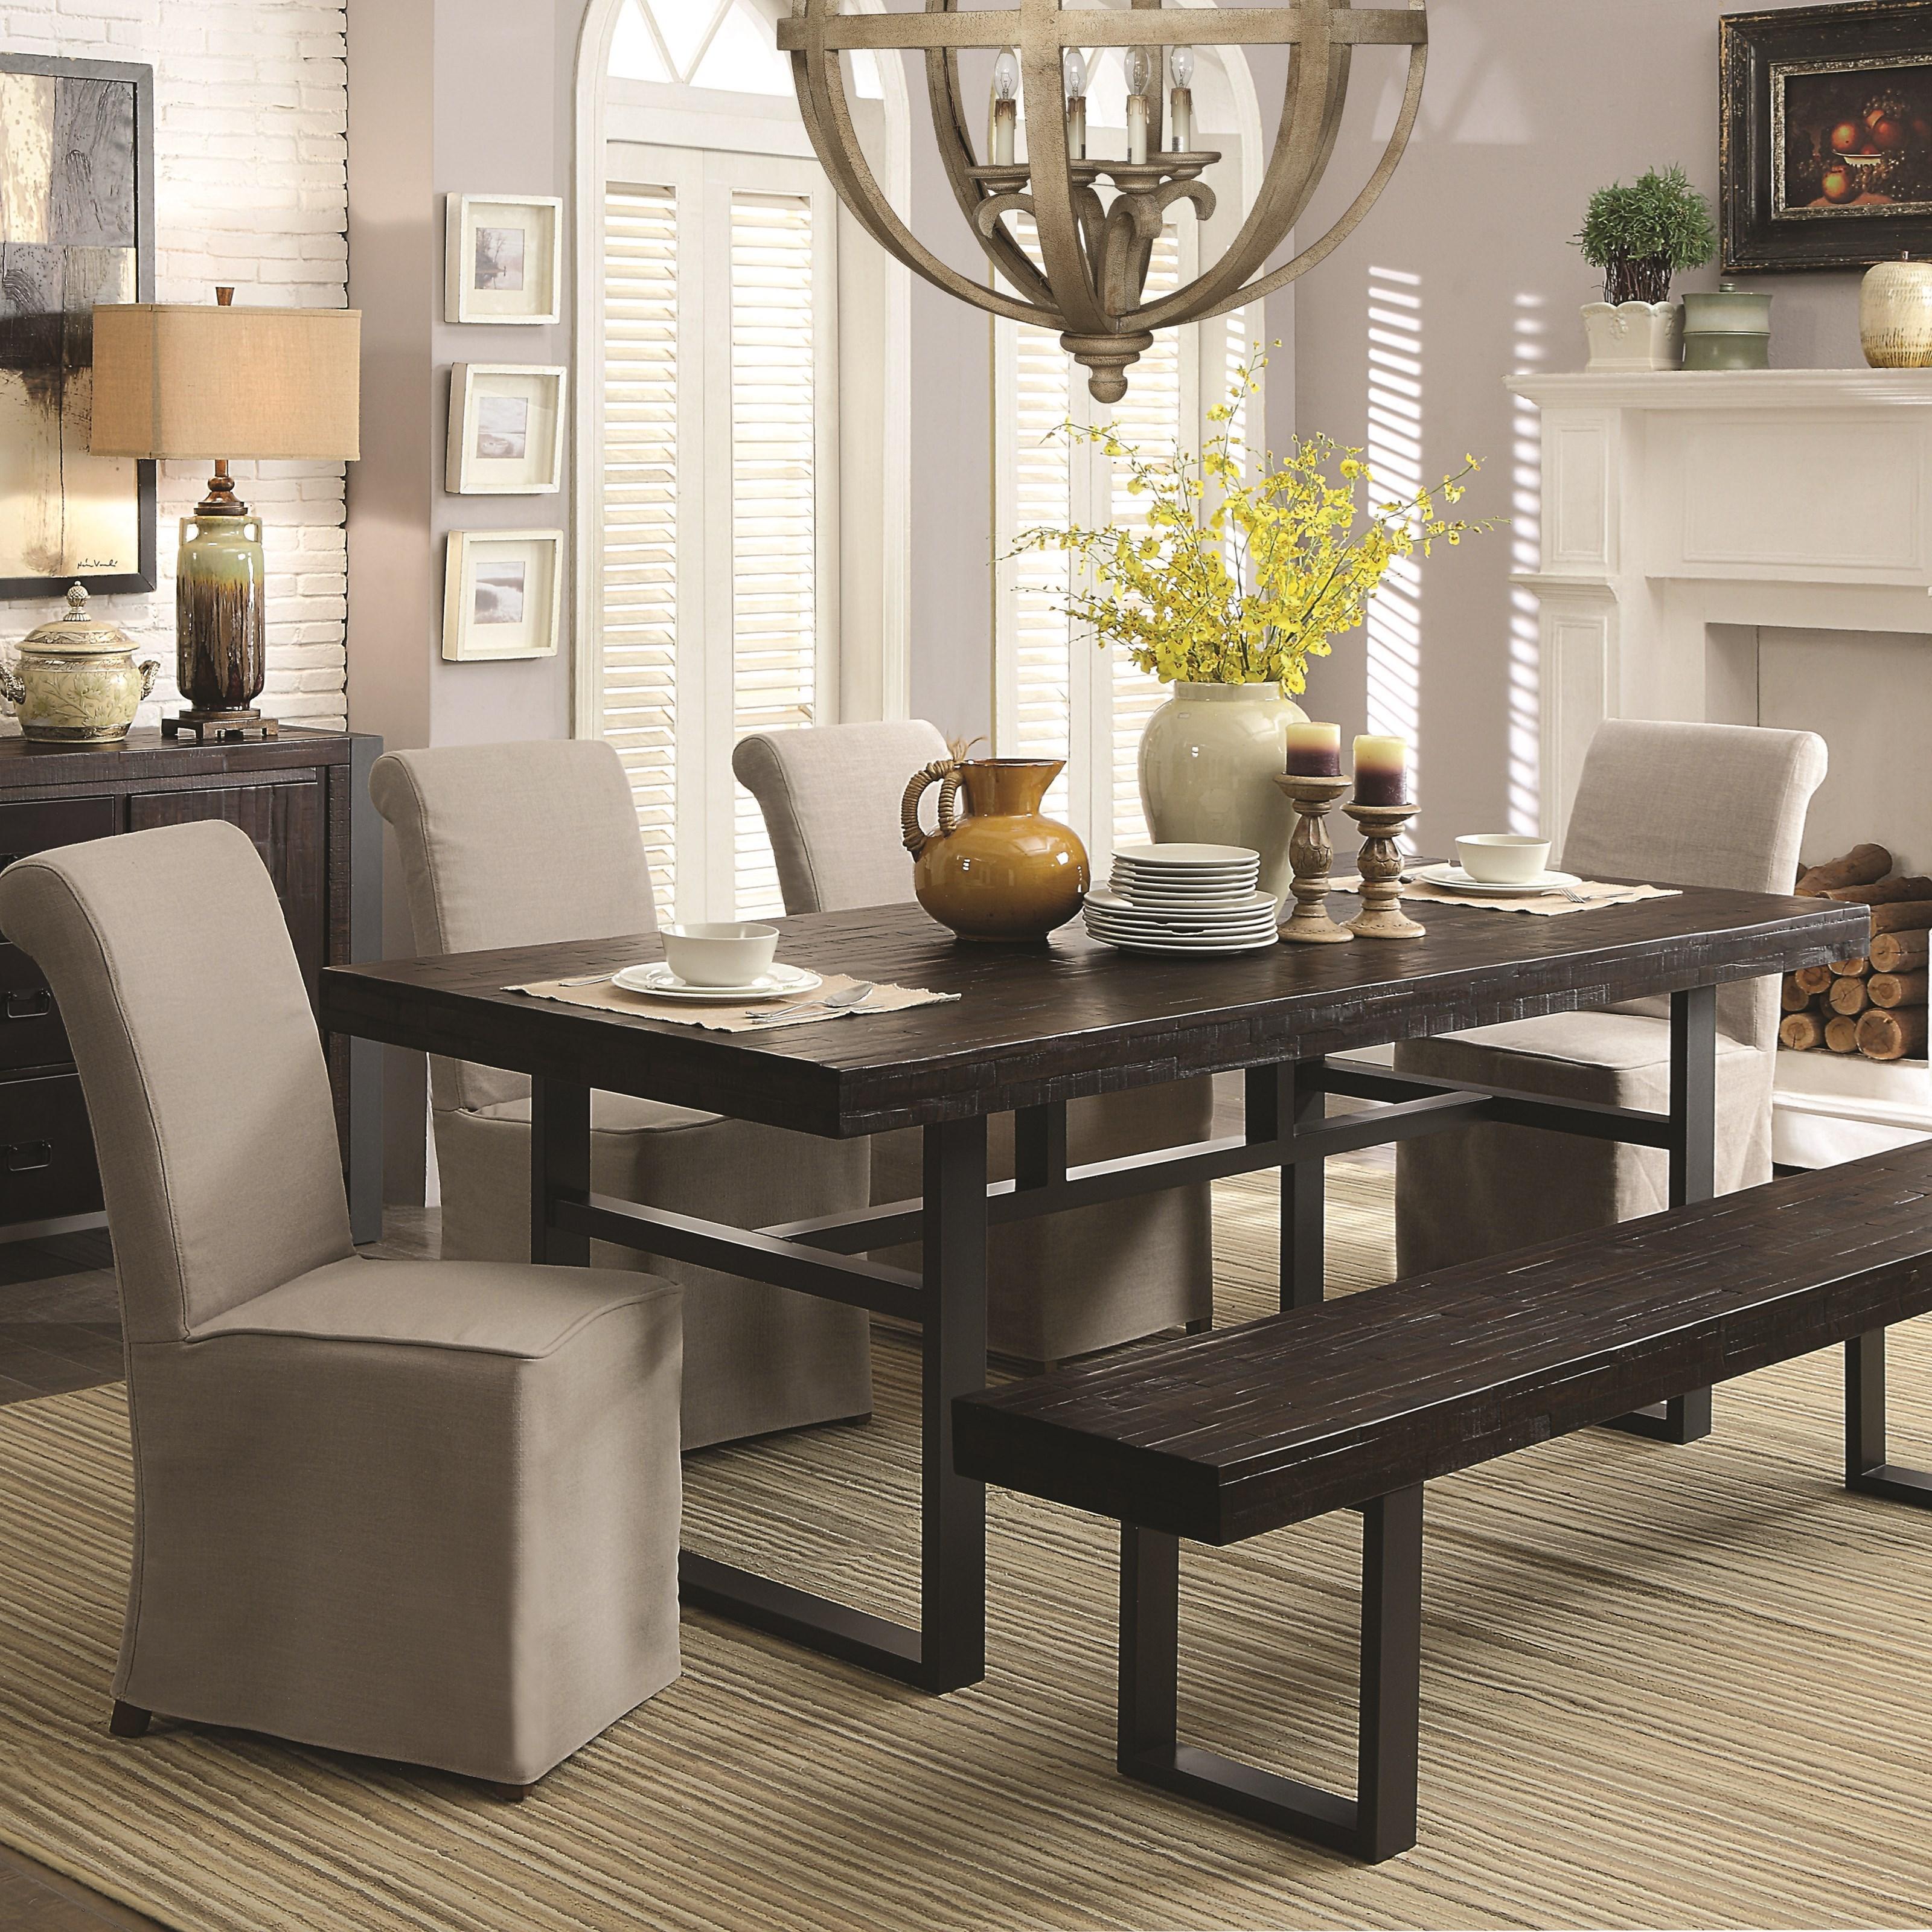 Coaster Keller6 Piece Dining Set with Bench